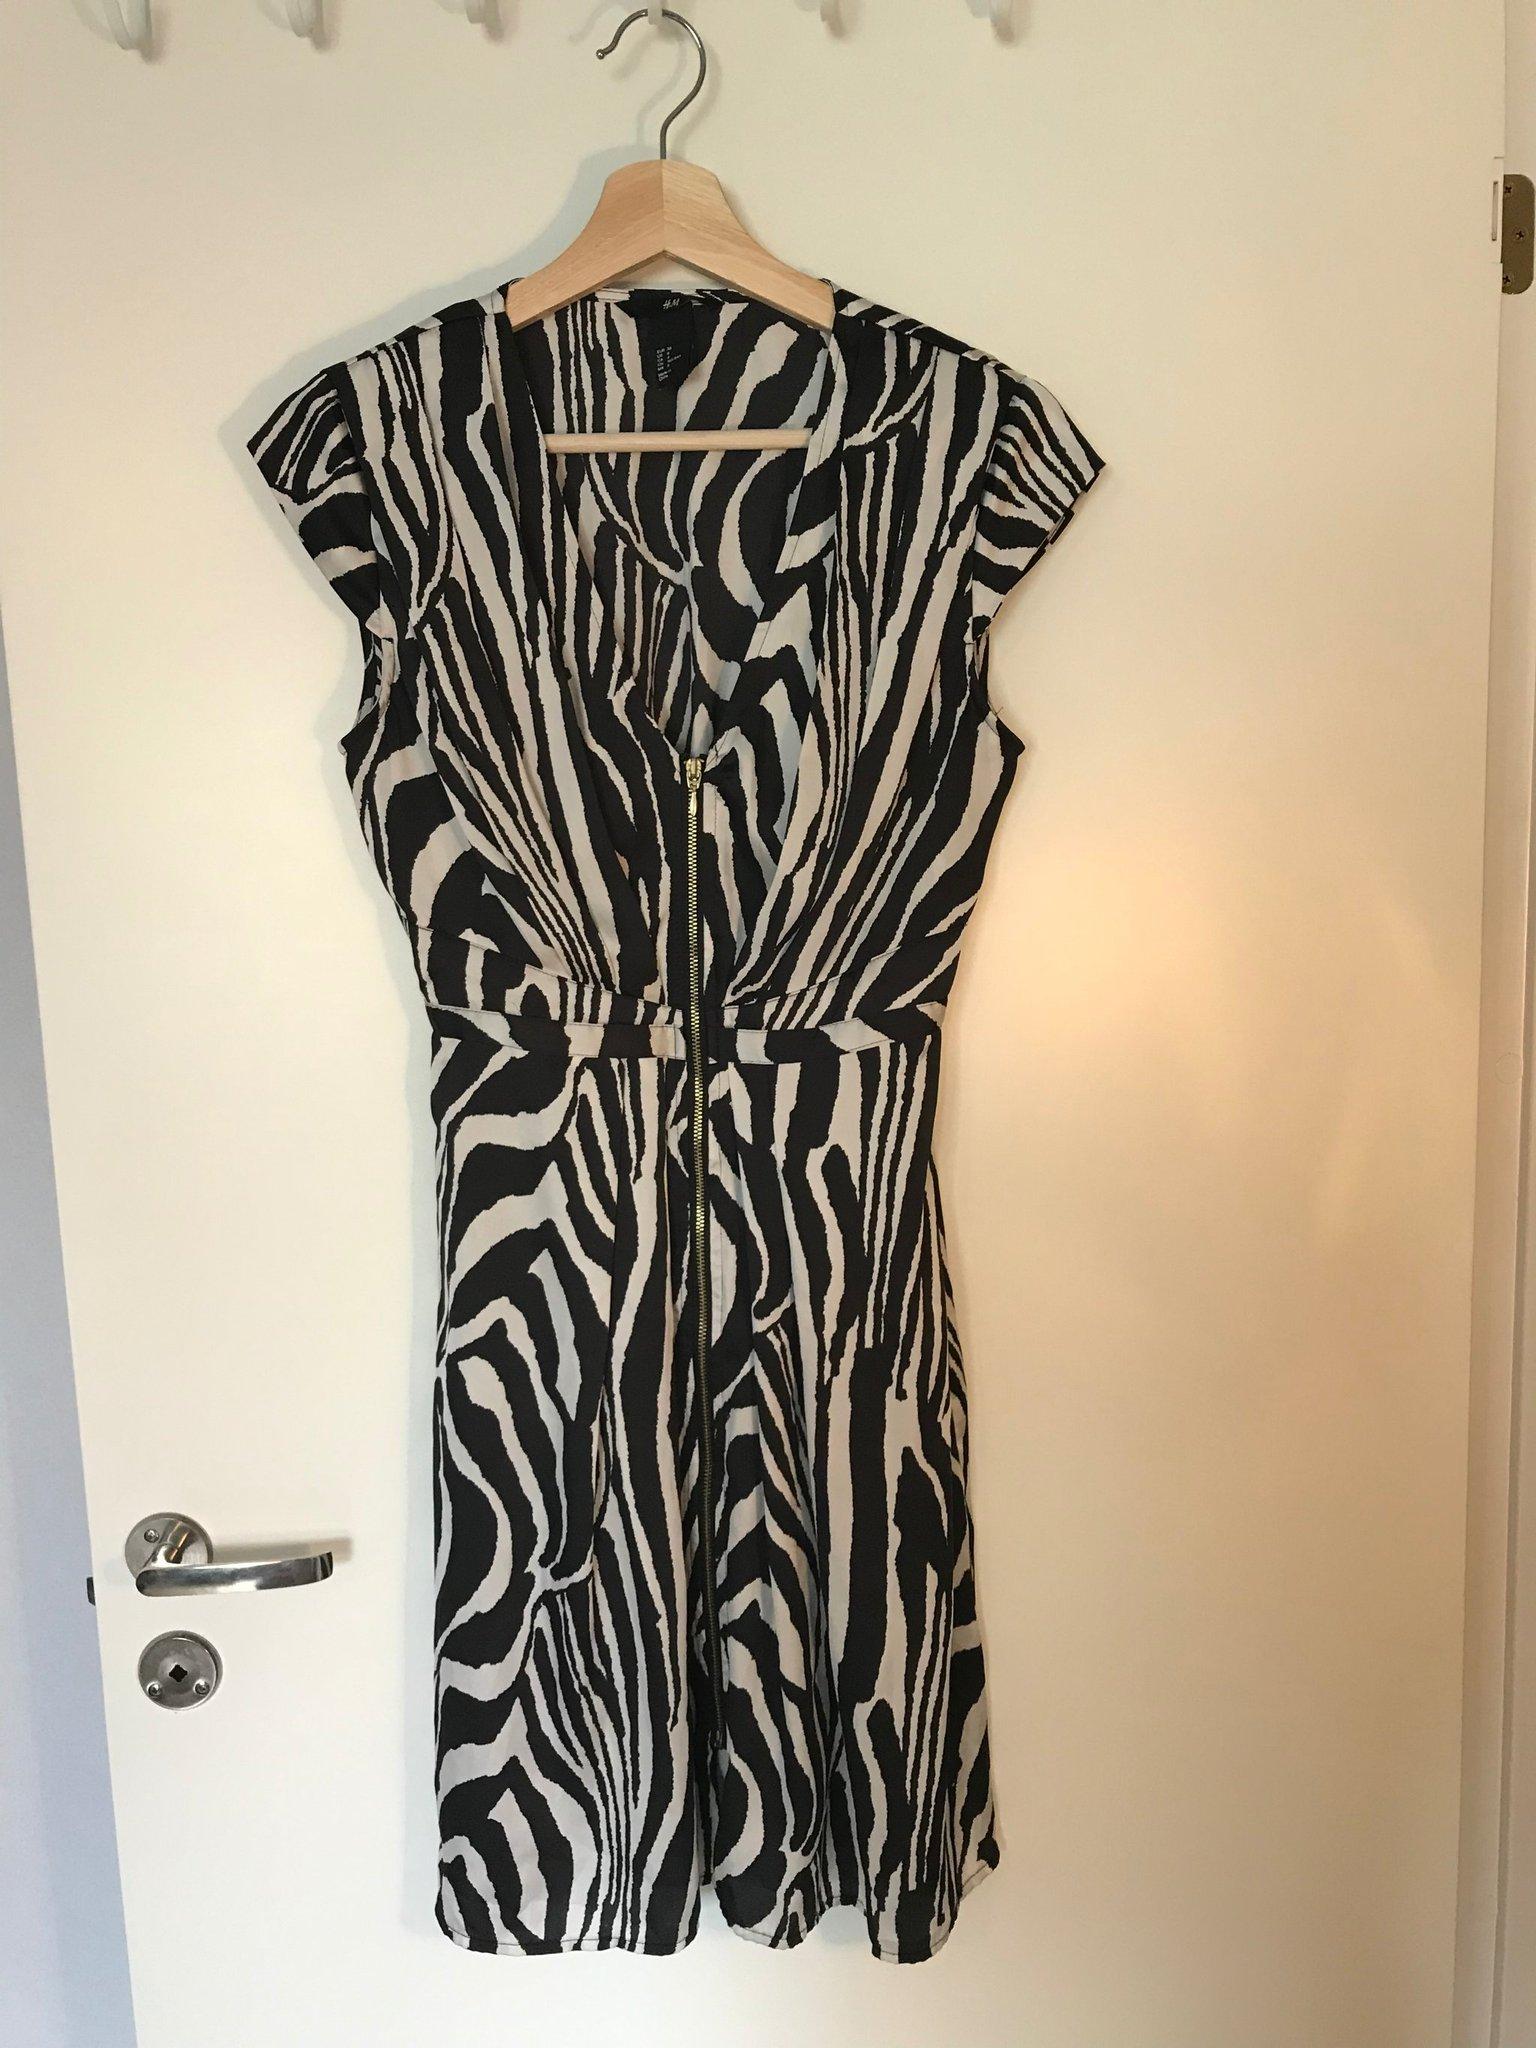 H&M zebra mönstrad svart vit fest party klänning (364438759